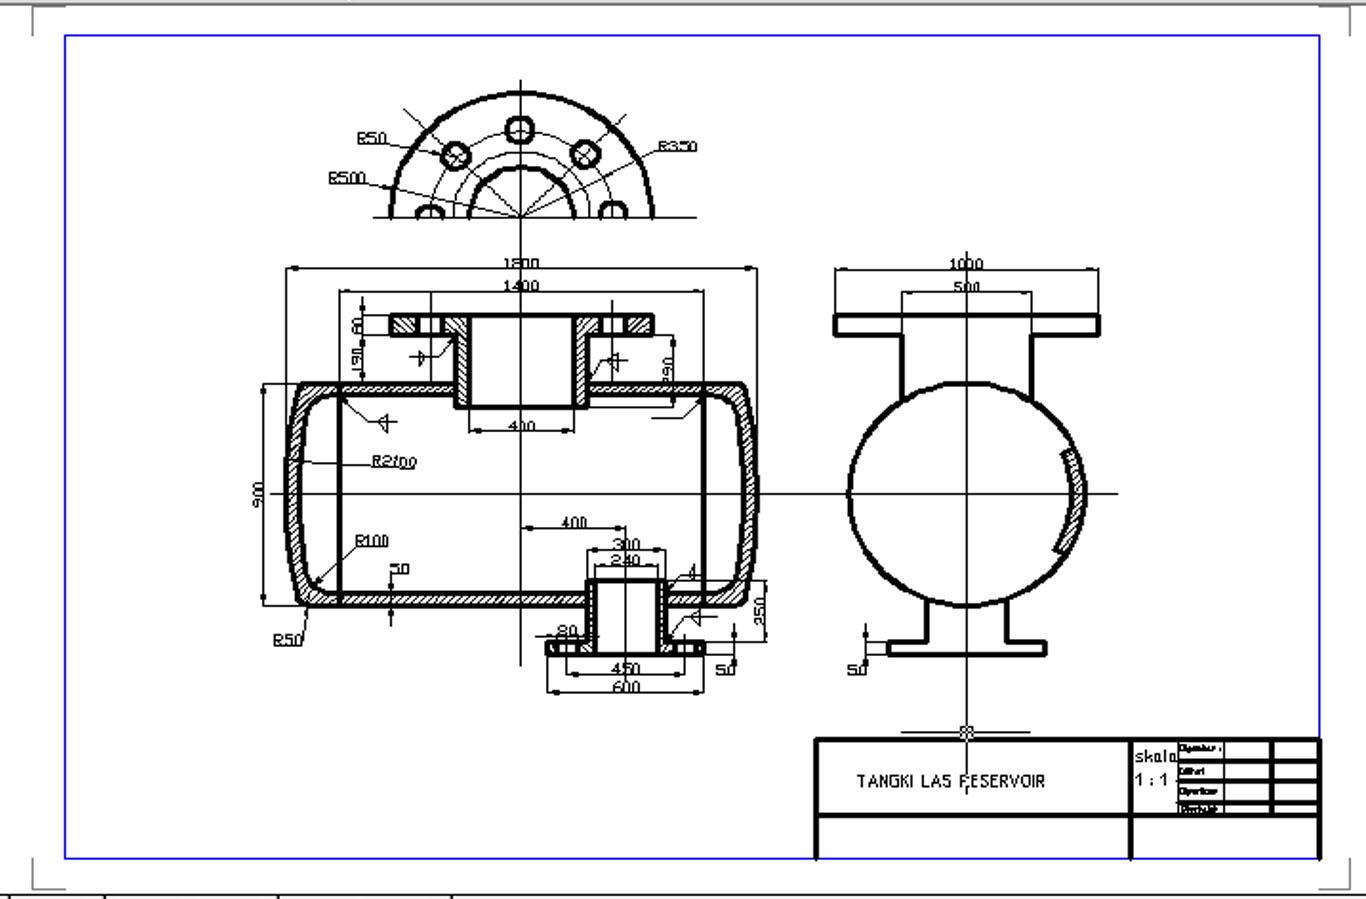 Technic Autocad Working Drawings Welding Tank Reservoir